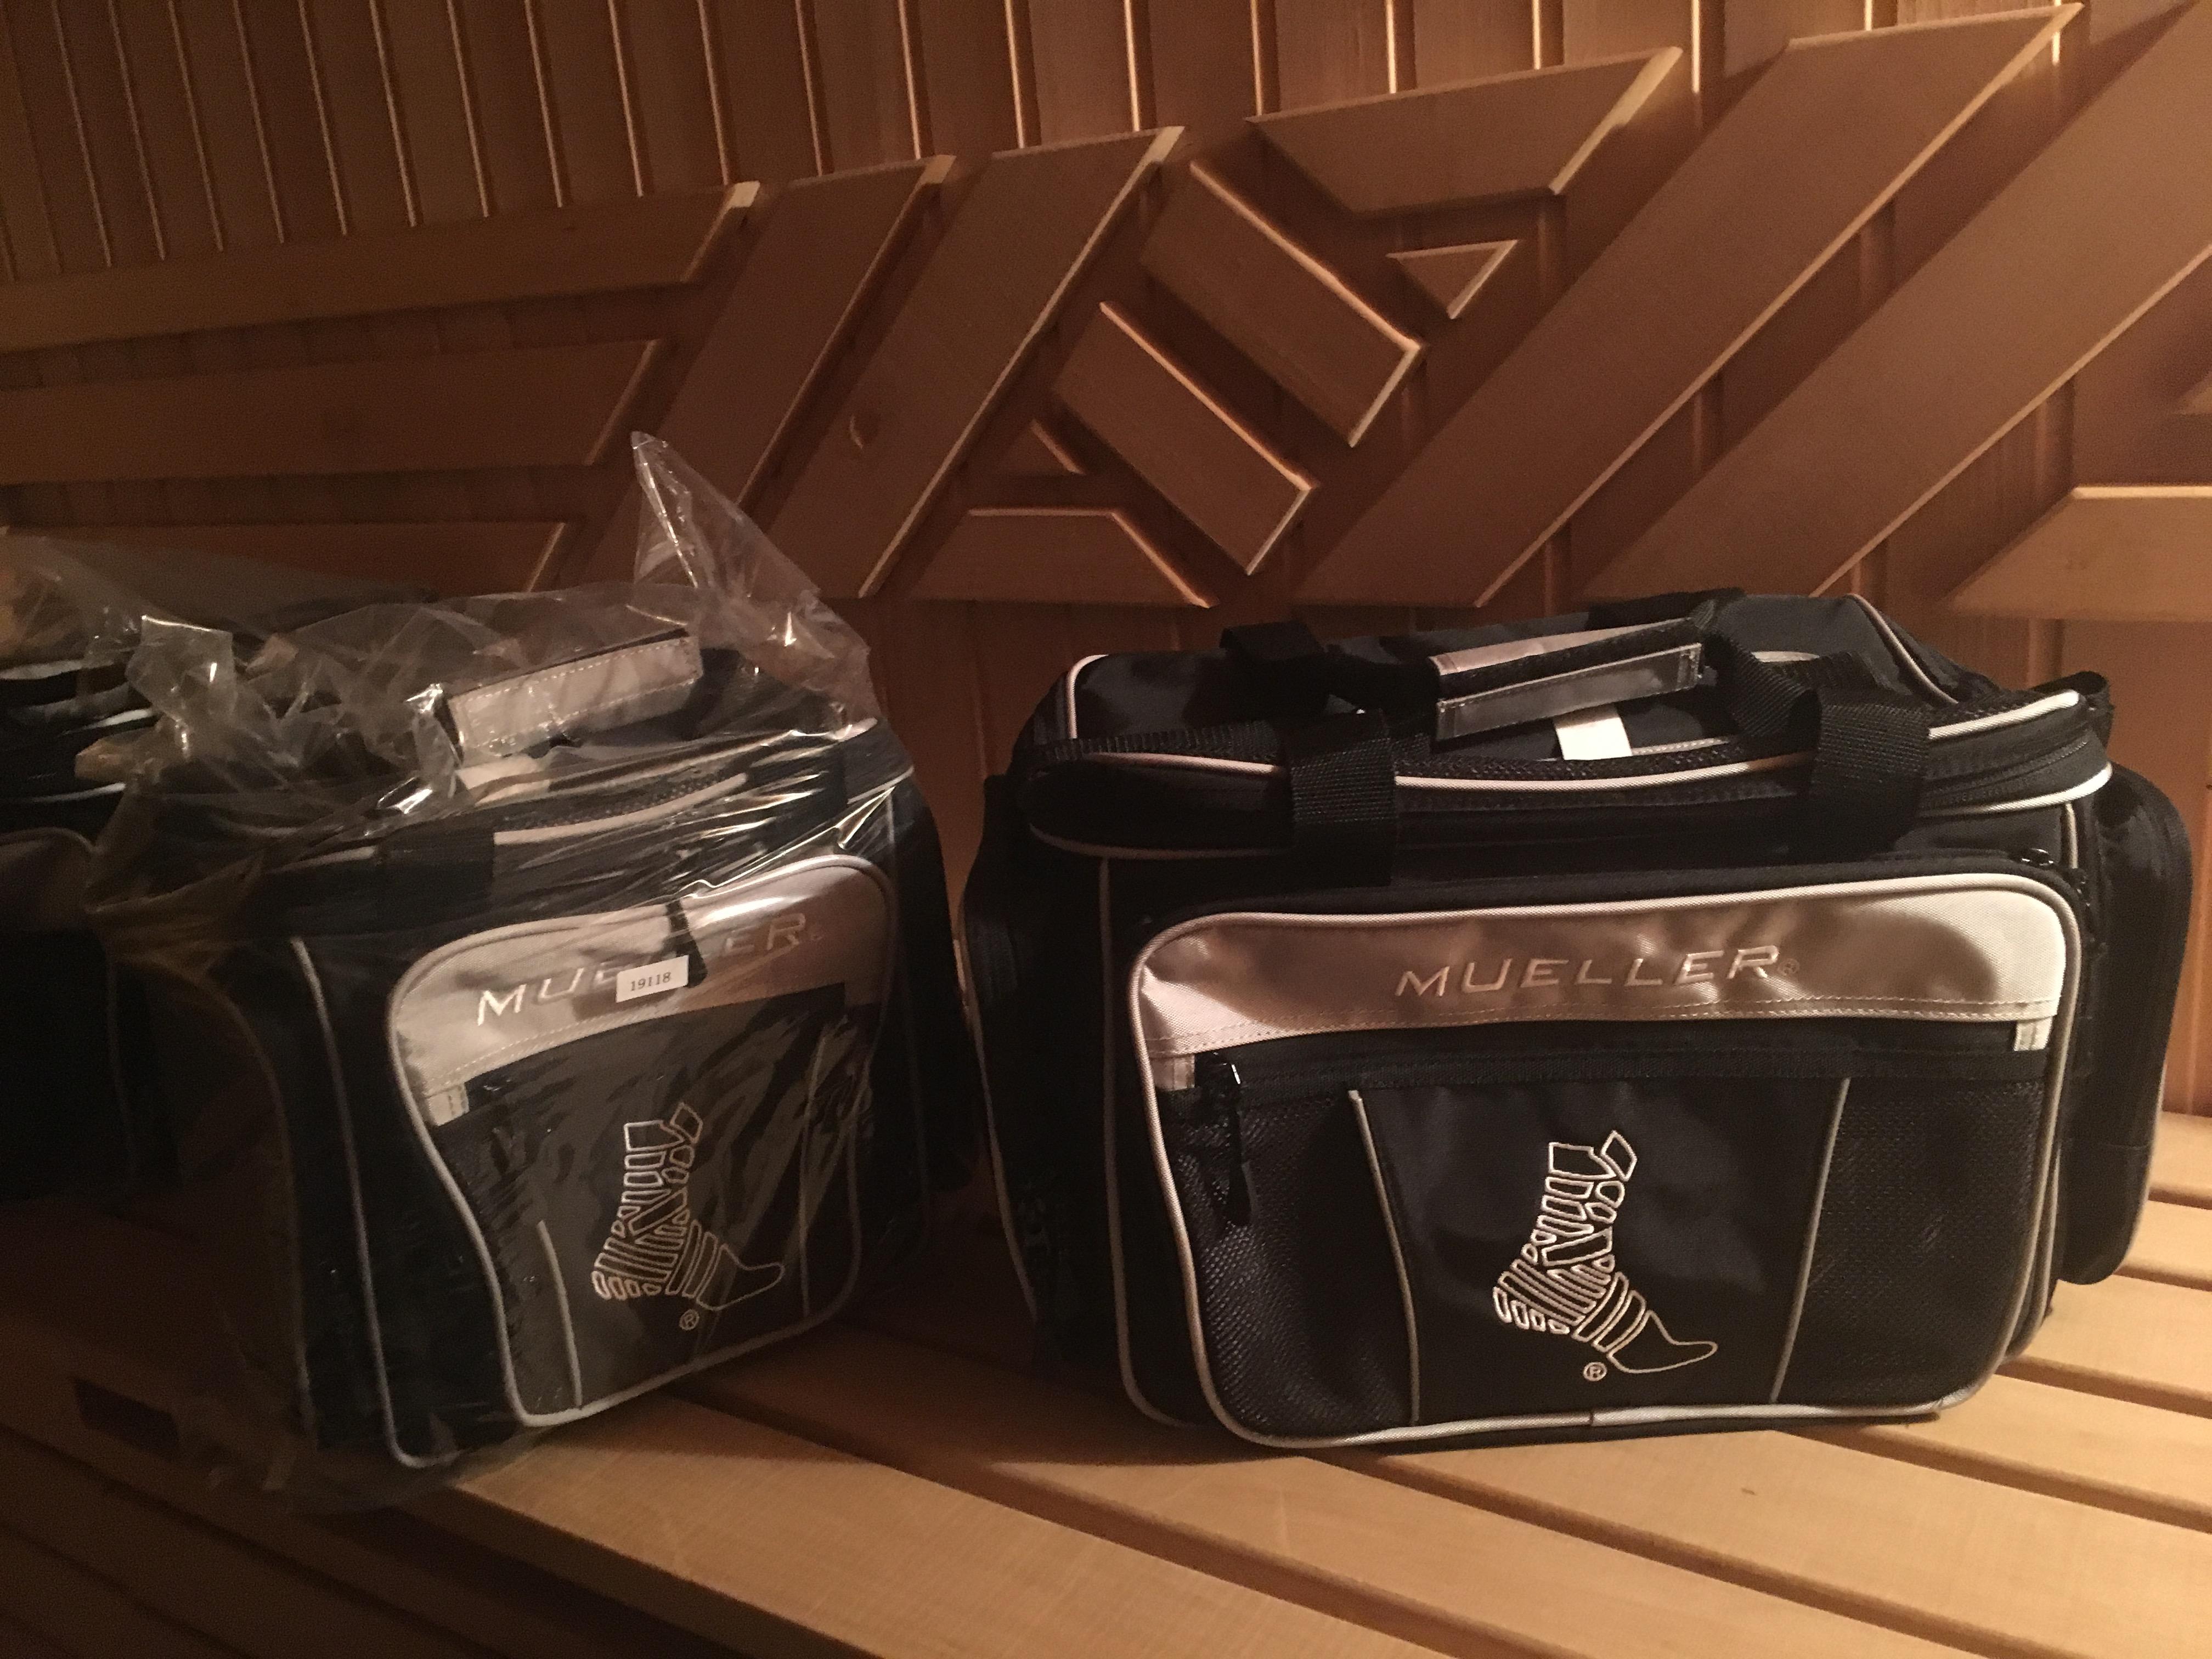 "19119NEW !!! MUELLER HERO® Response, Прочная, легкая нейлоновая сумка со сменными аксессуарами, премиум ручки, светоотражающие вставки,  38х25,5х25,5 см  (включая: M2 Clear Poket 10x10"" )"